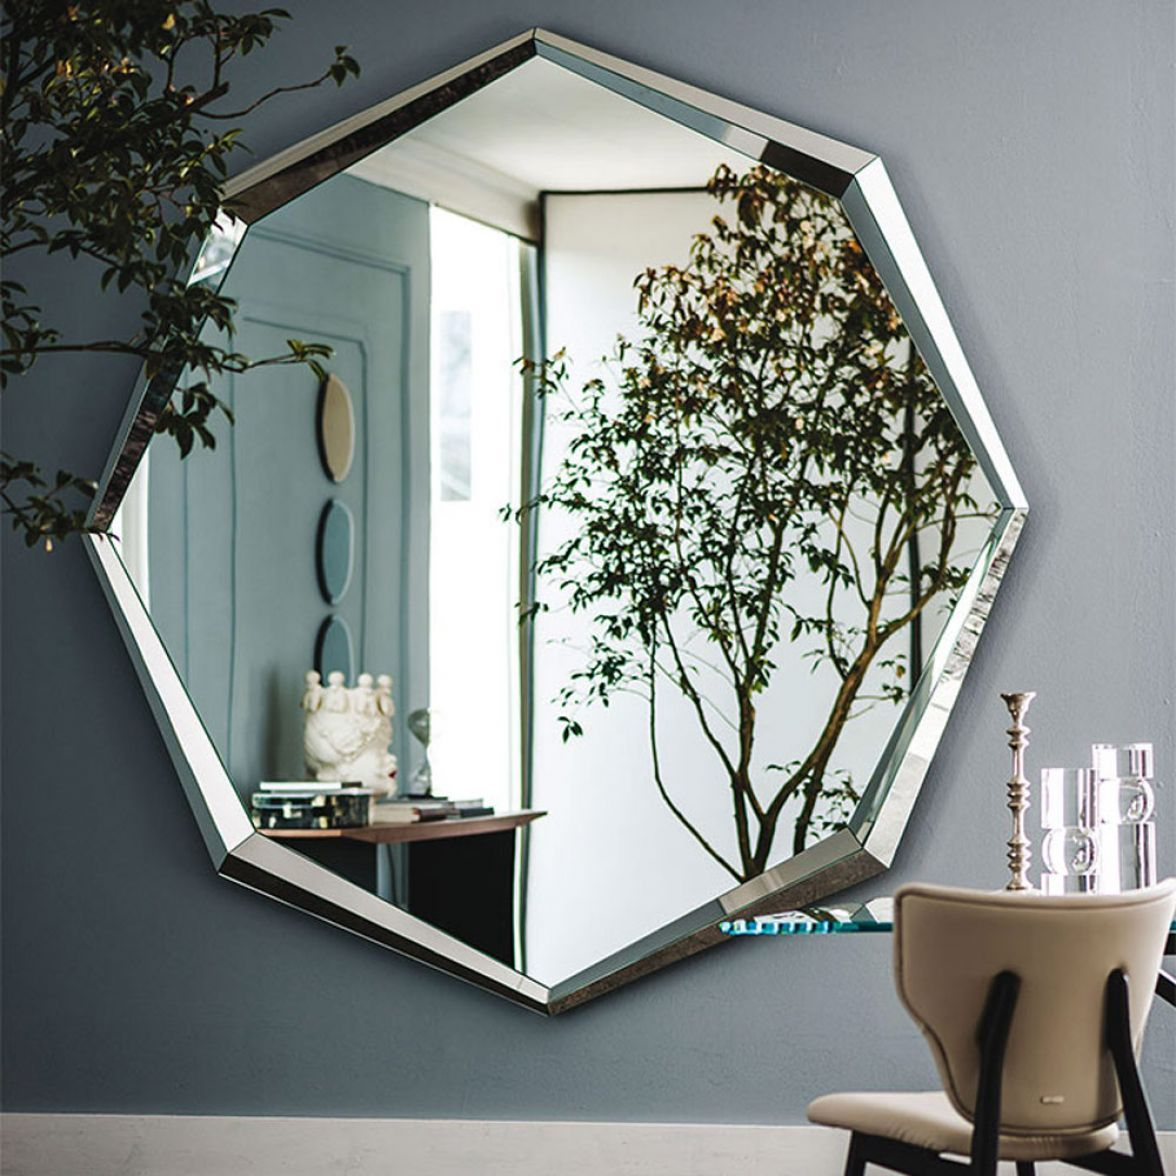 Emerald Magnum mirror фото цена